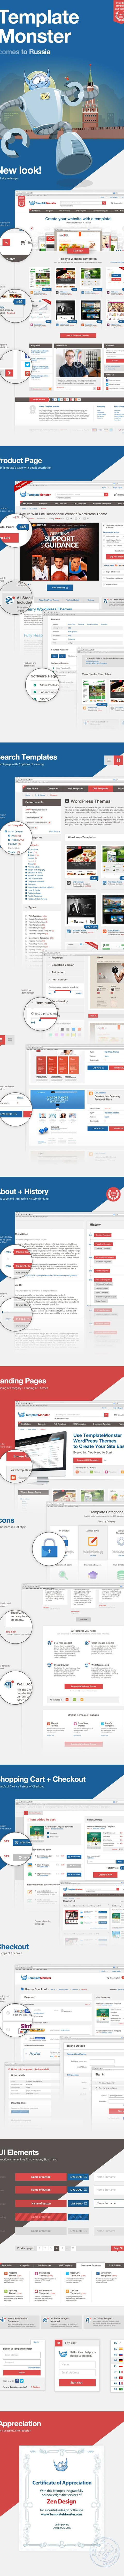 TemplateMonster – 2013 redesign